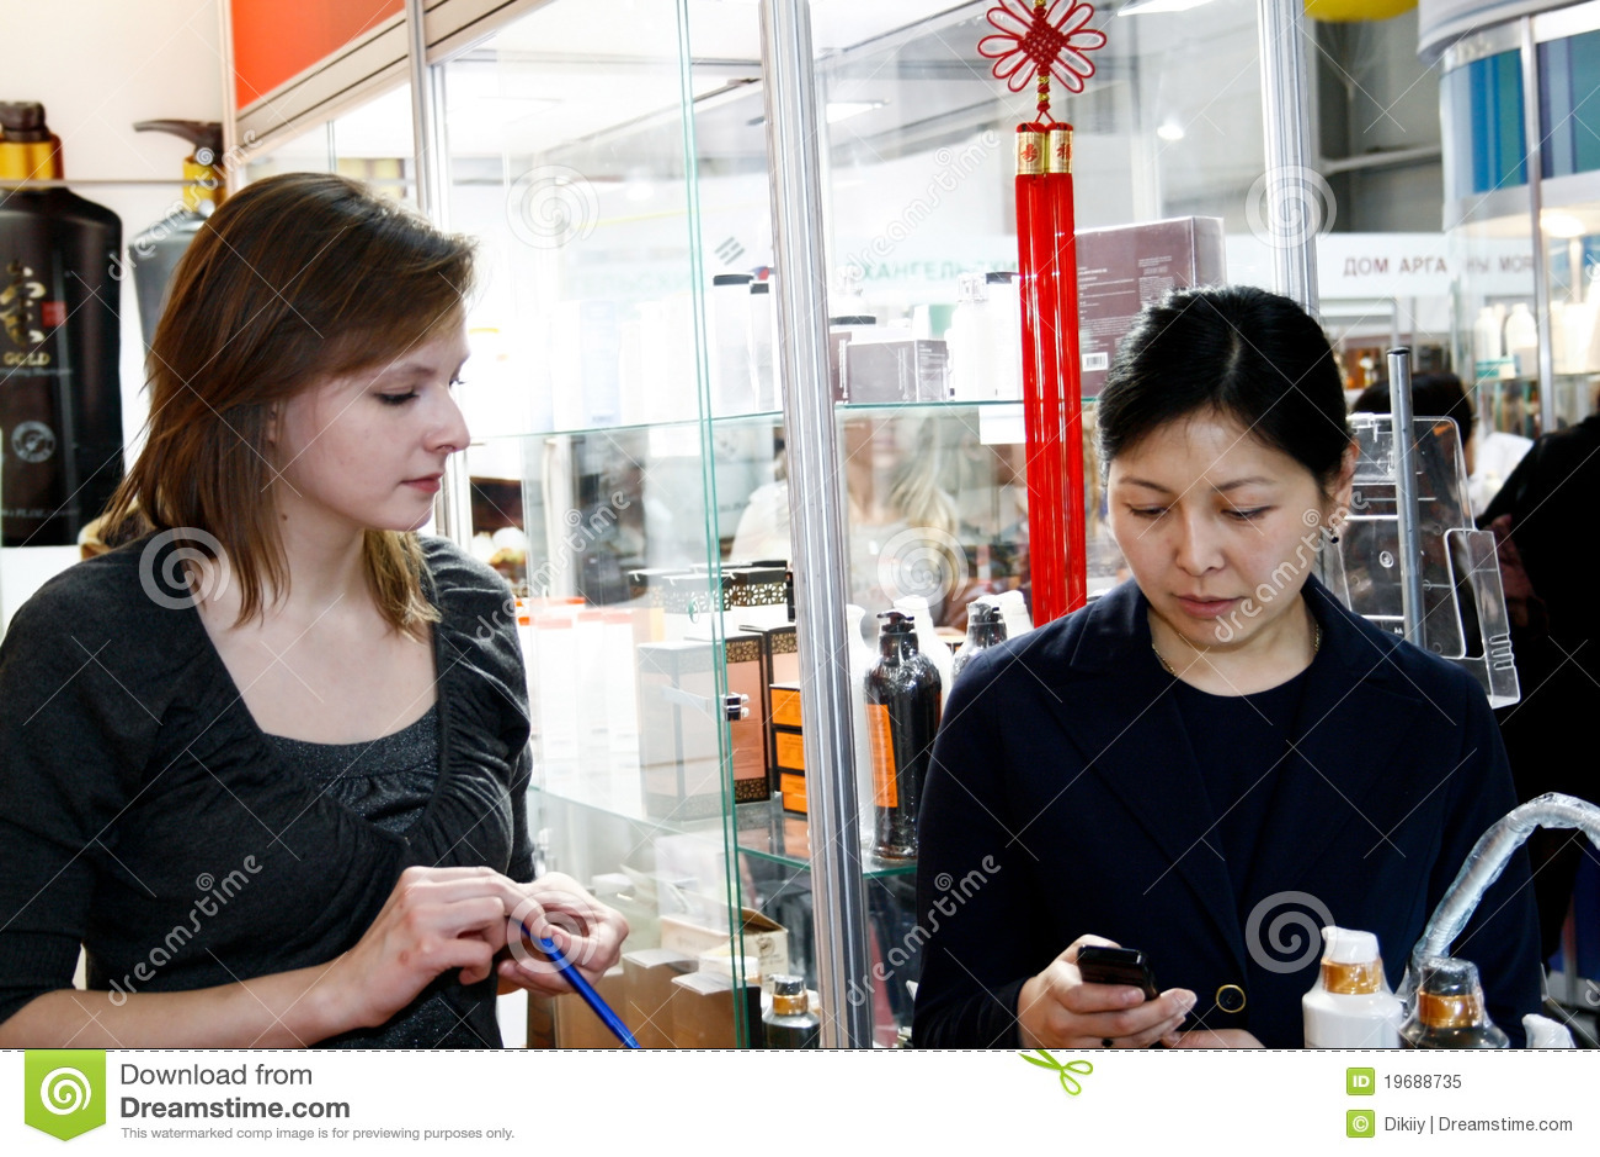 Asian Woman Sells 112